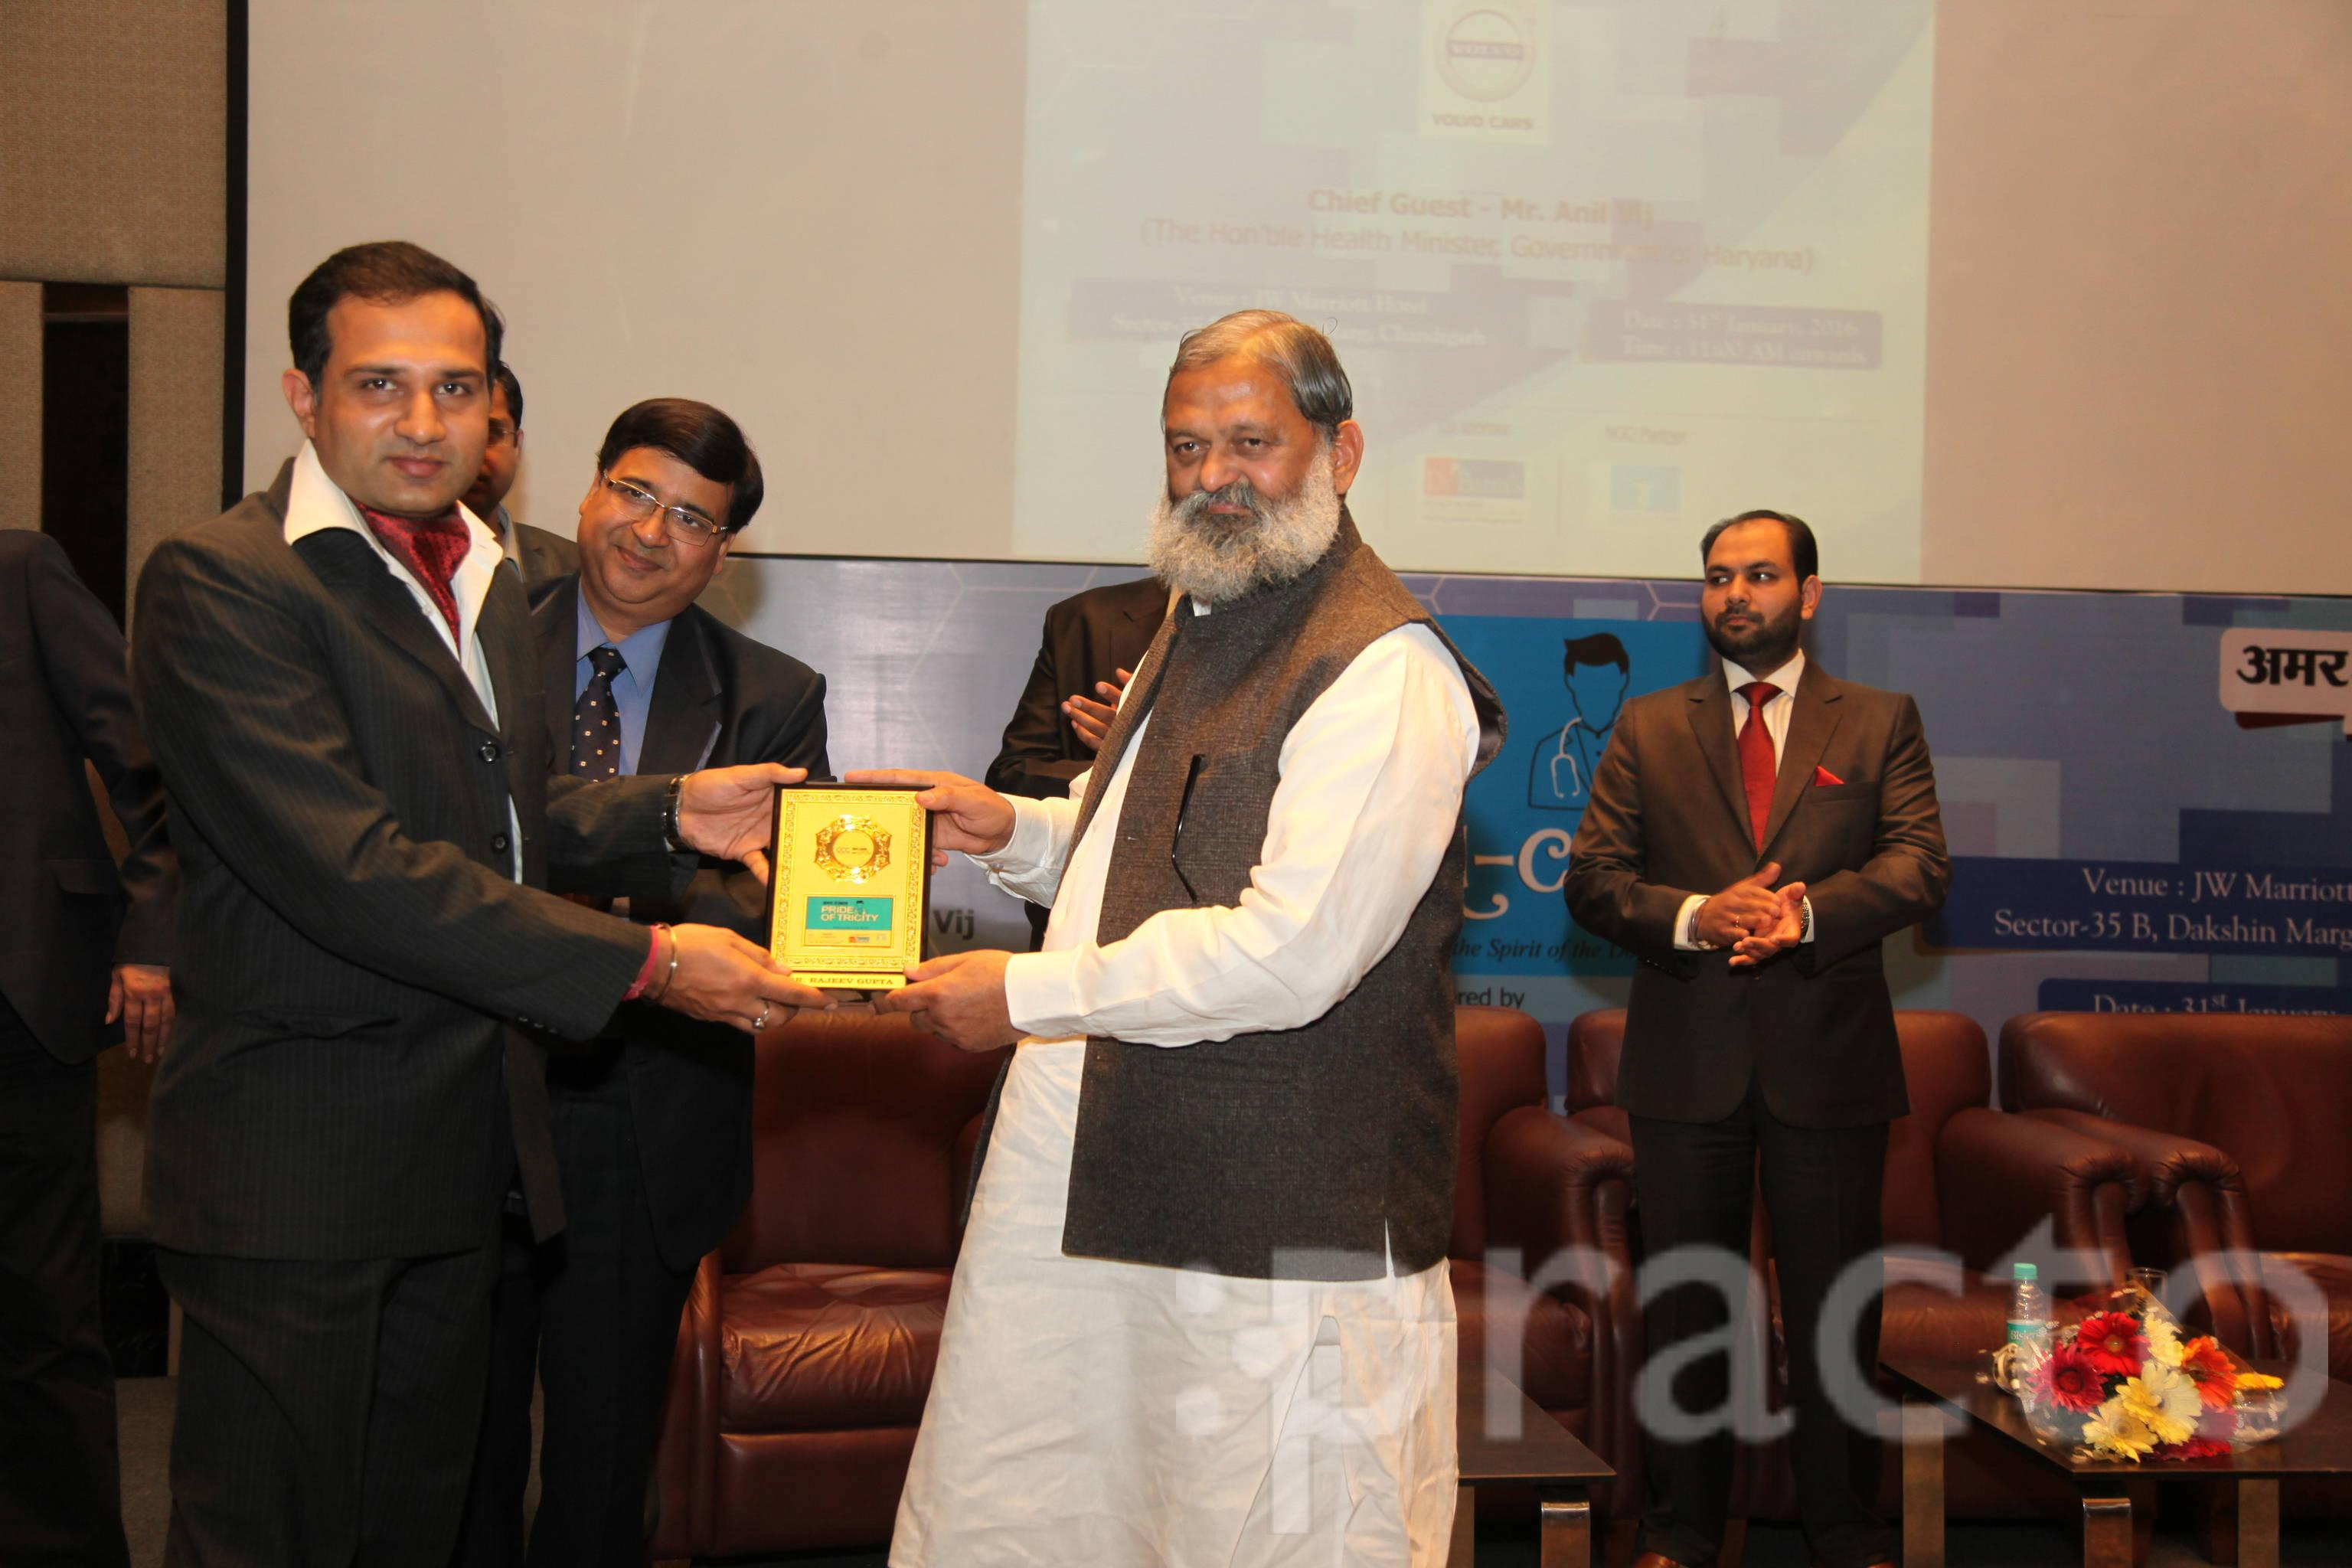 Dr. Rajiv Gupta - Internal Medicine